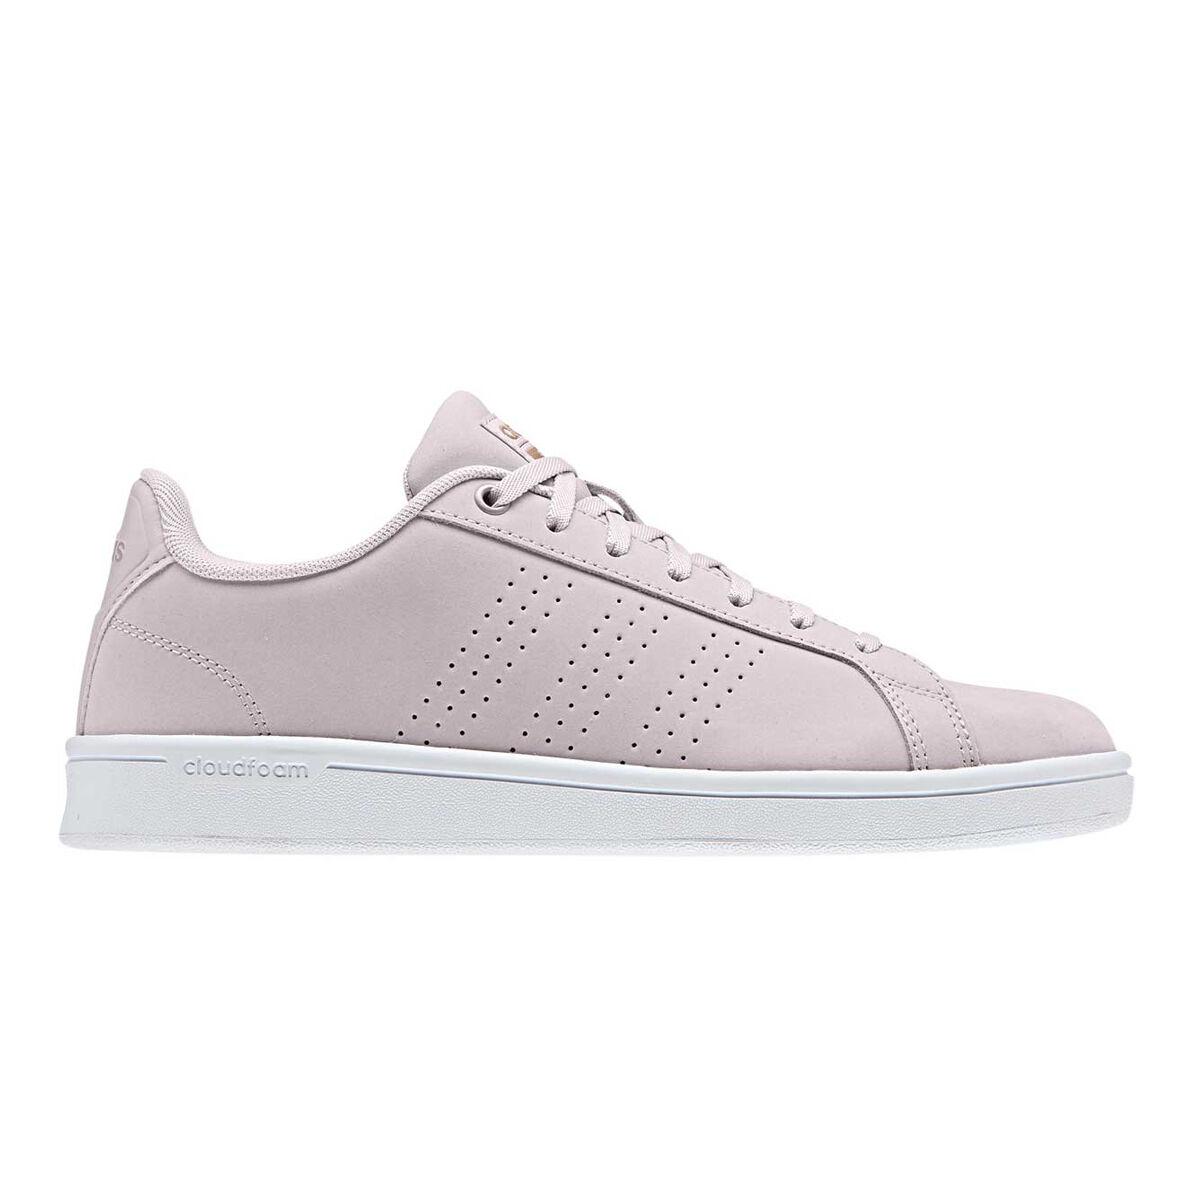 Adidas Cloudfoam Advantage Women's Leather Casual Shoes | eBay